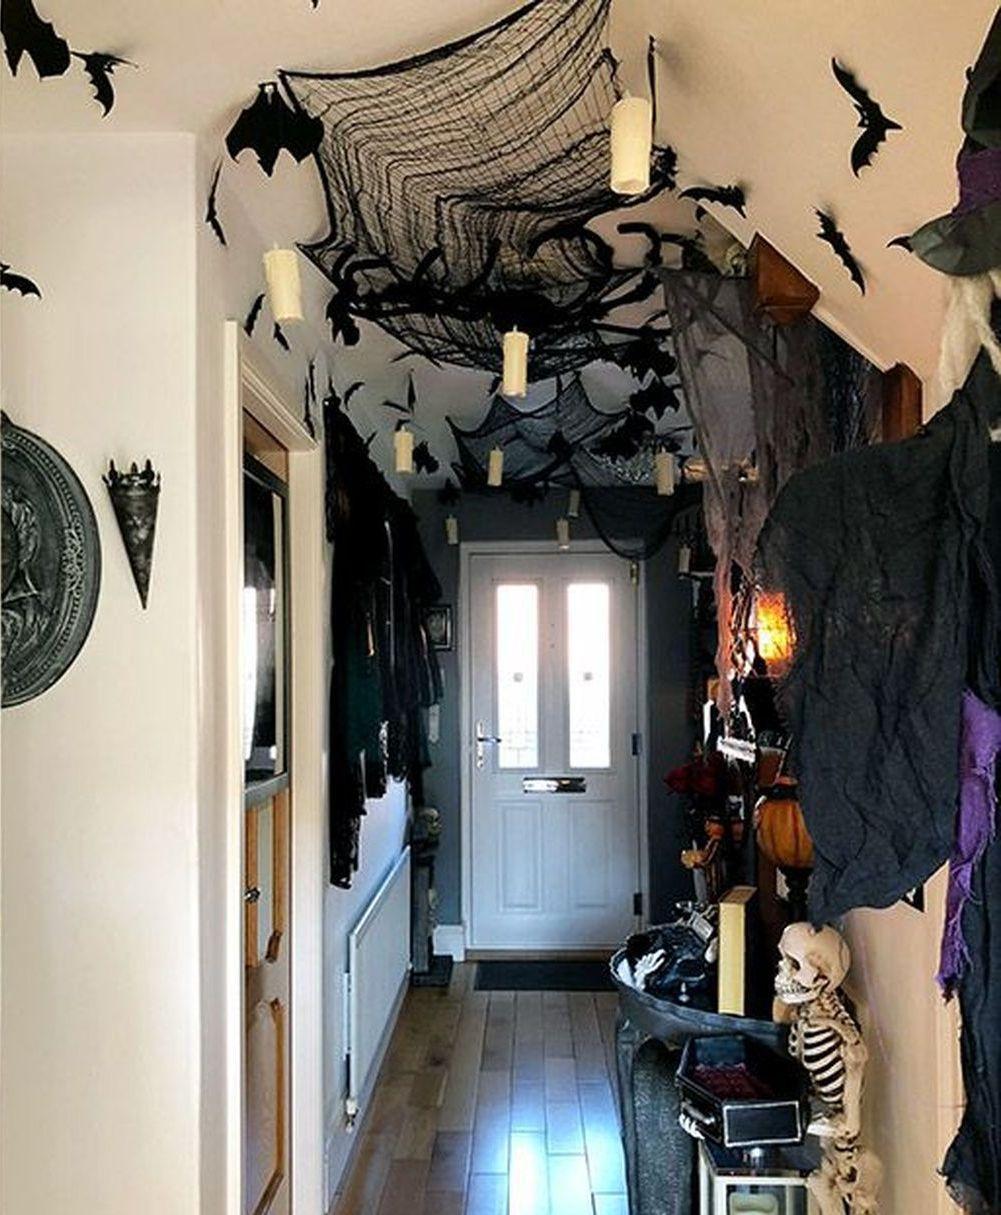 Amazon.com: dorm decorations